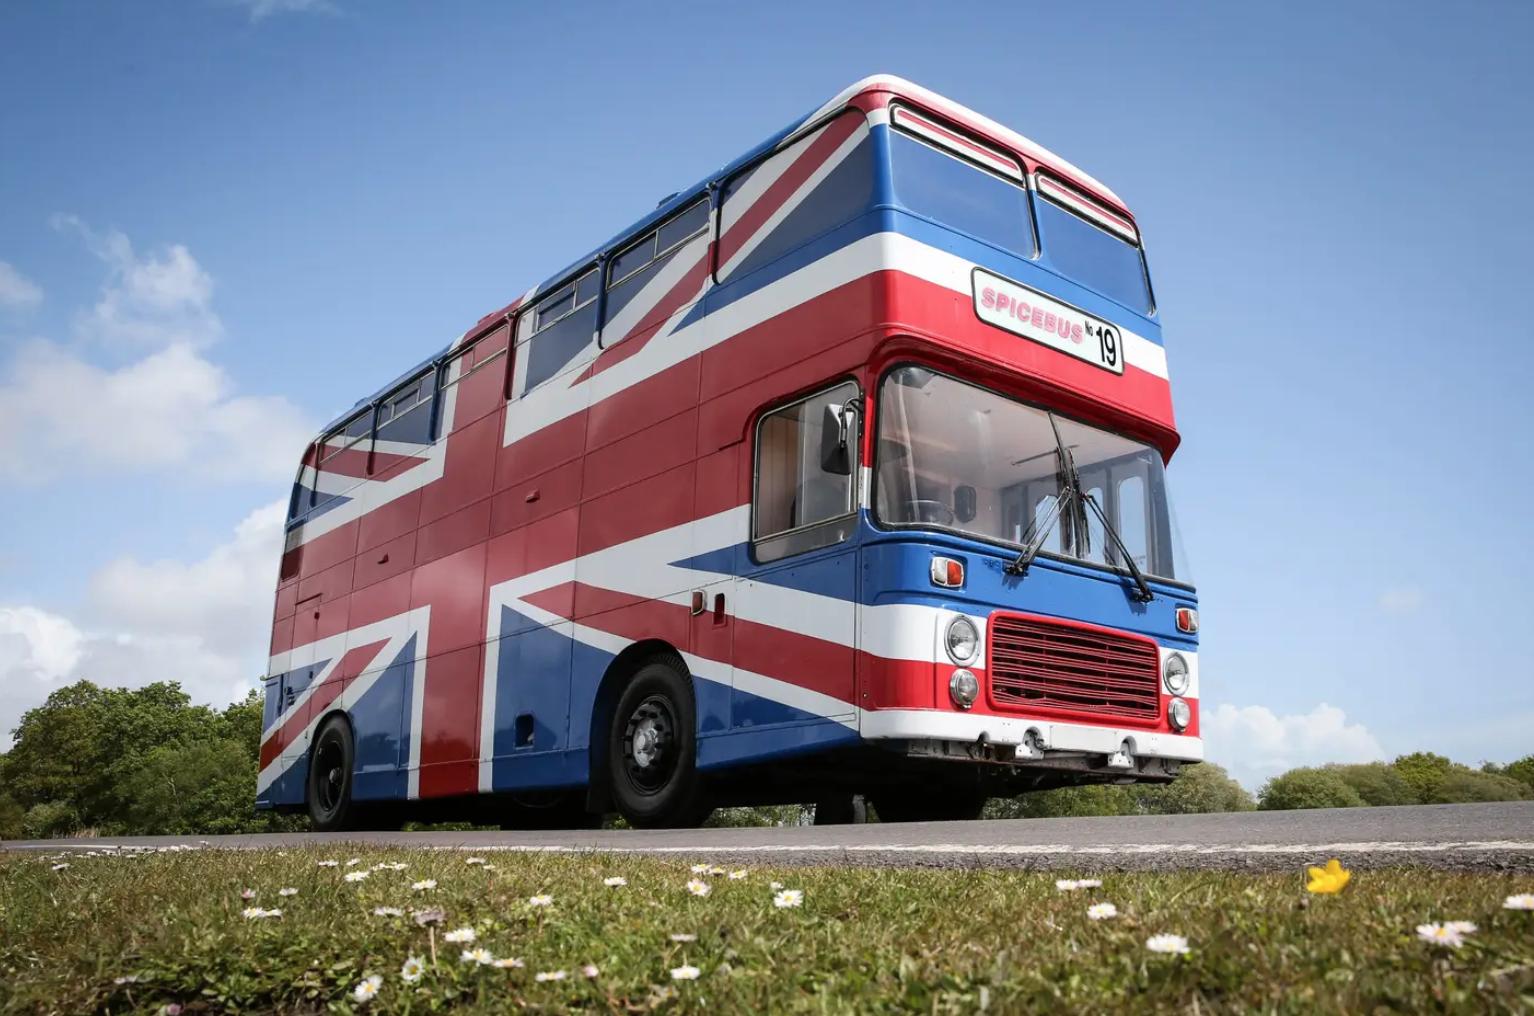 Bus de Spice Girls